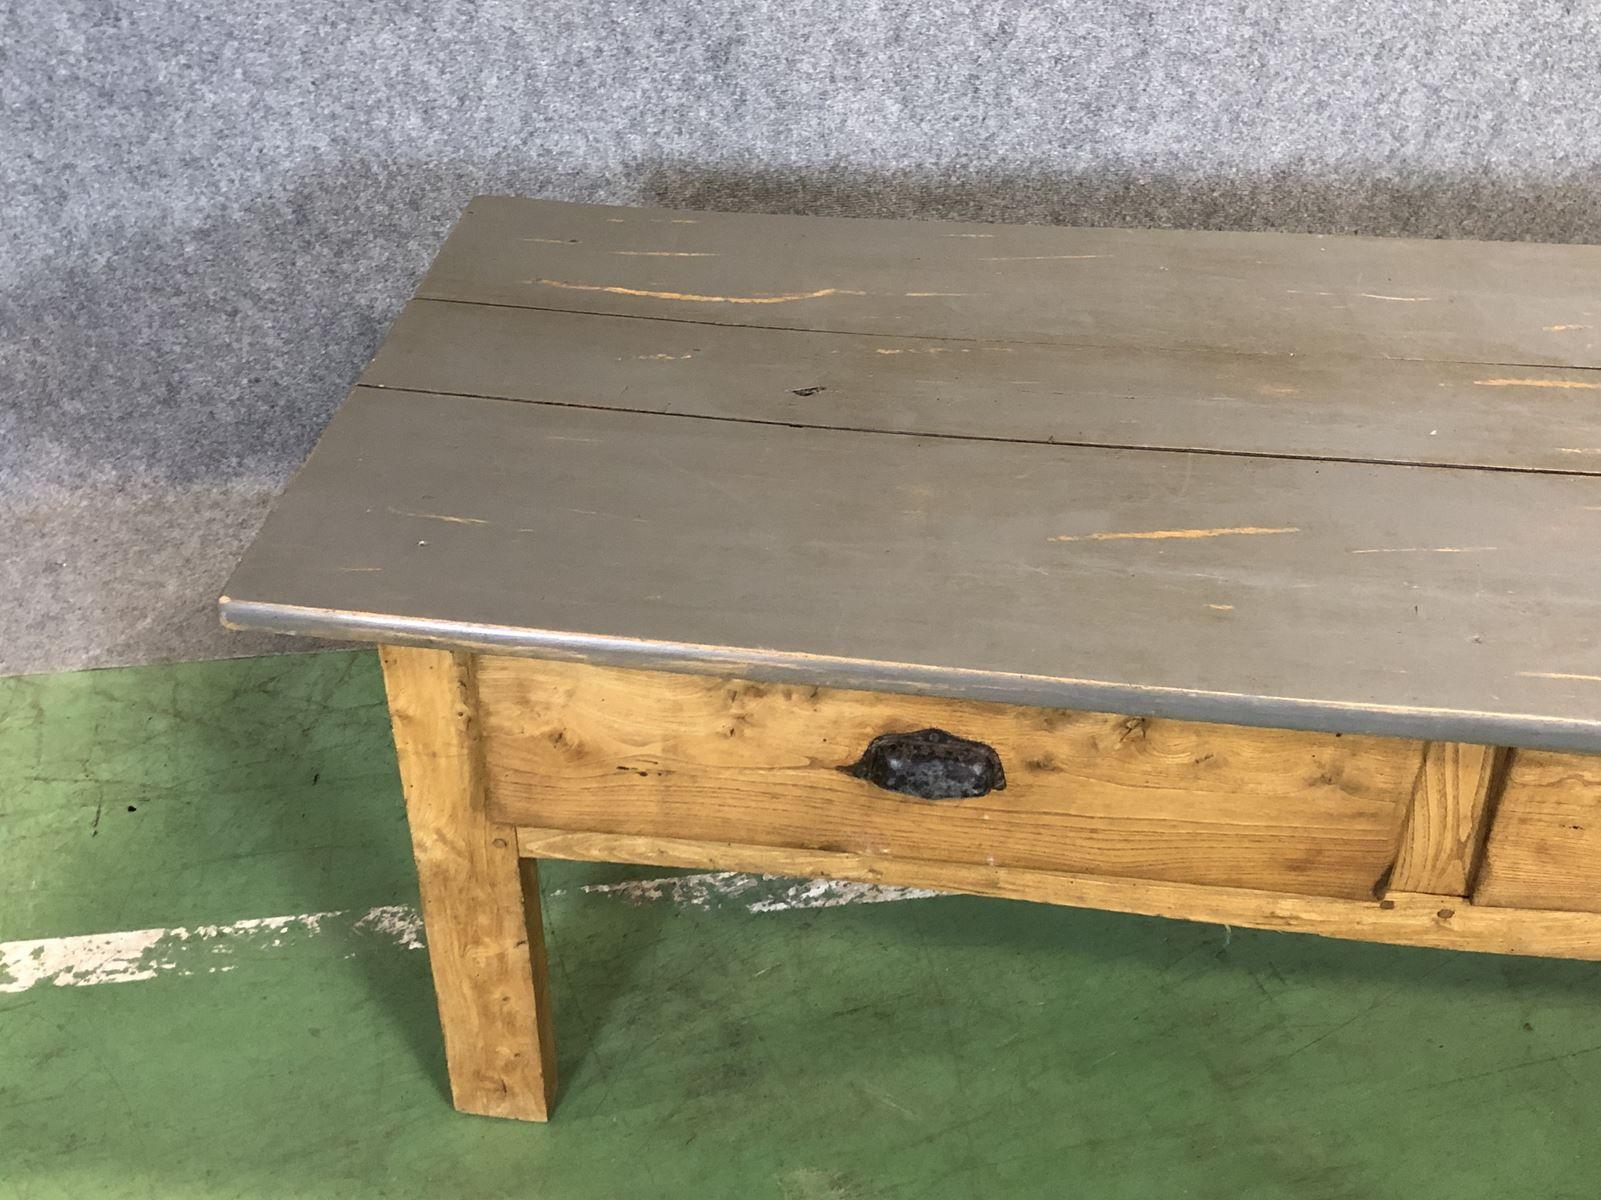 Couchtisch Ulmenholz Wohnzimmertisch Holz Metall 10017 Made House